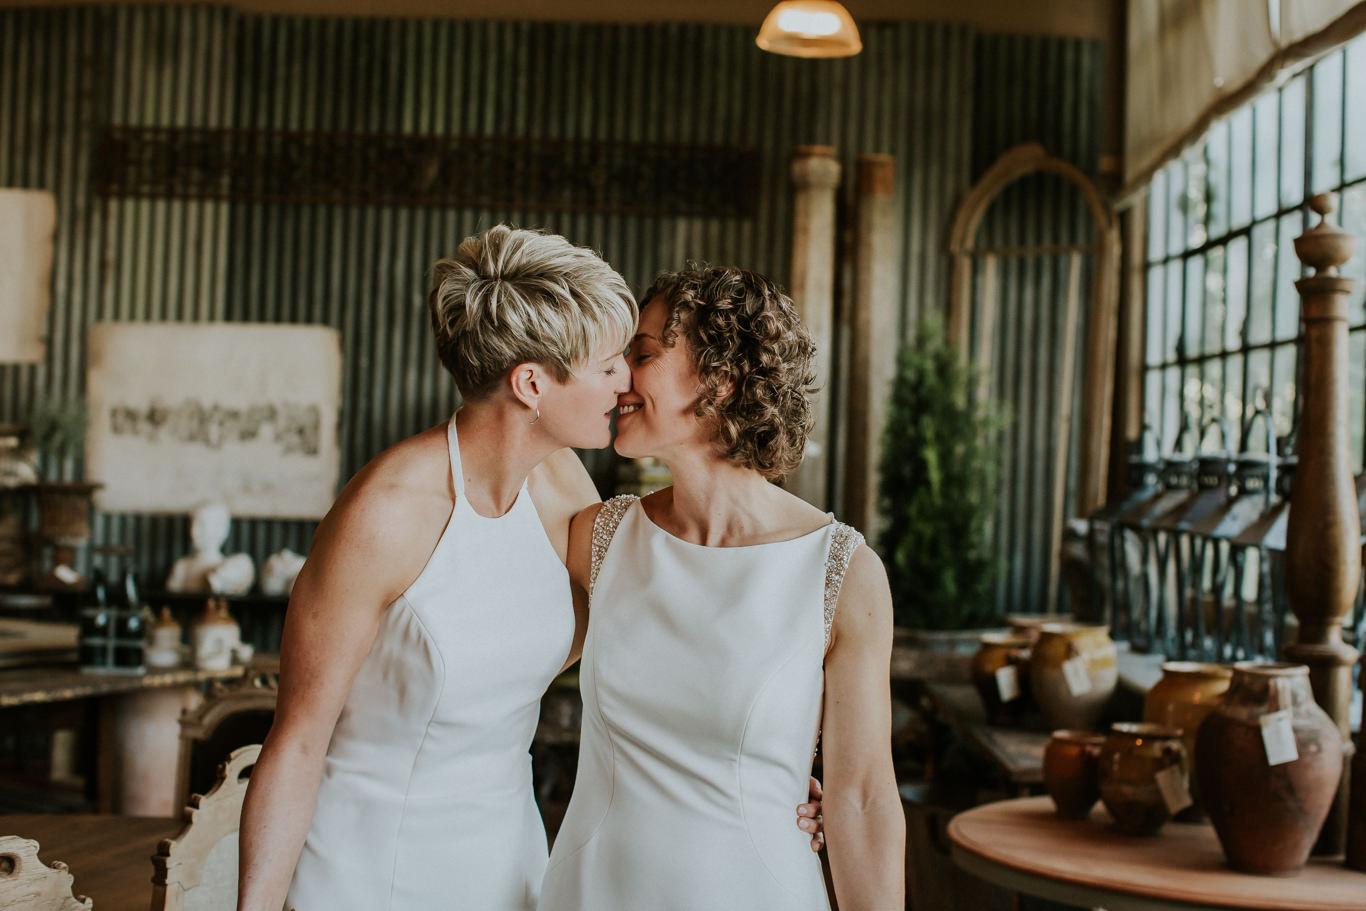 Lindsay-and-Heather-Charbar-Restaurant-Wedding-in-Calgary-26